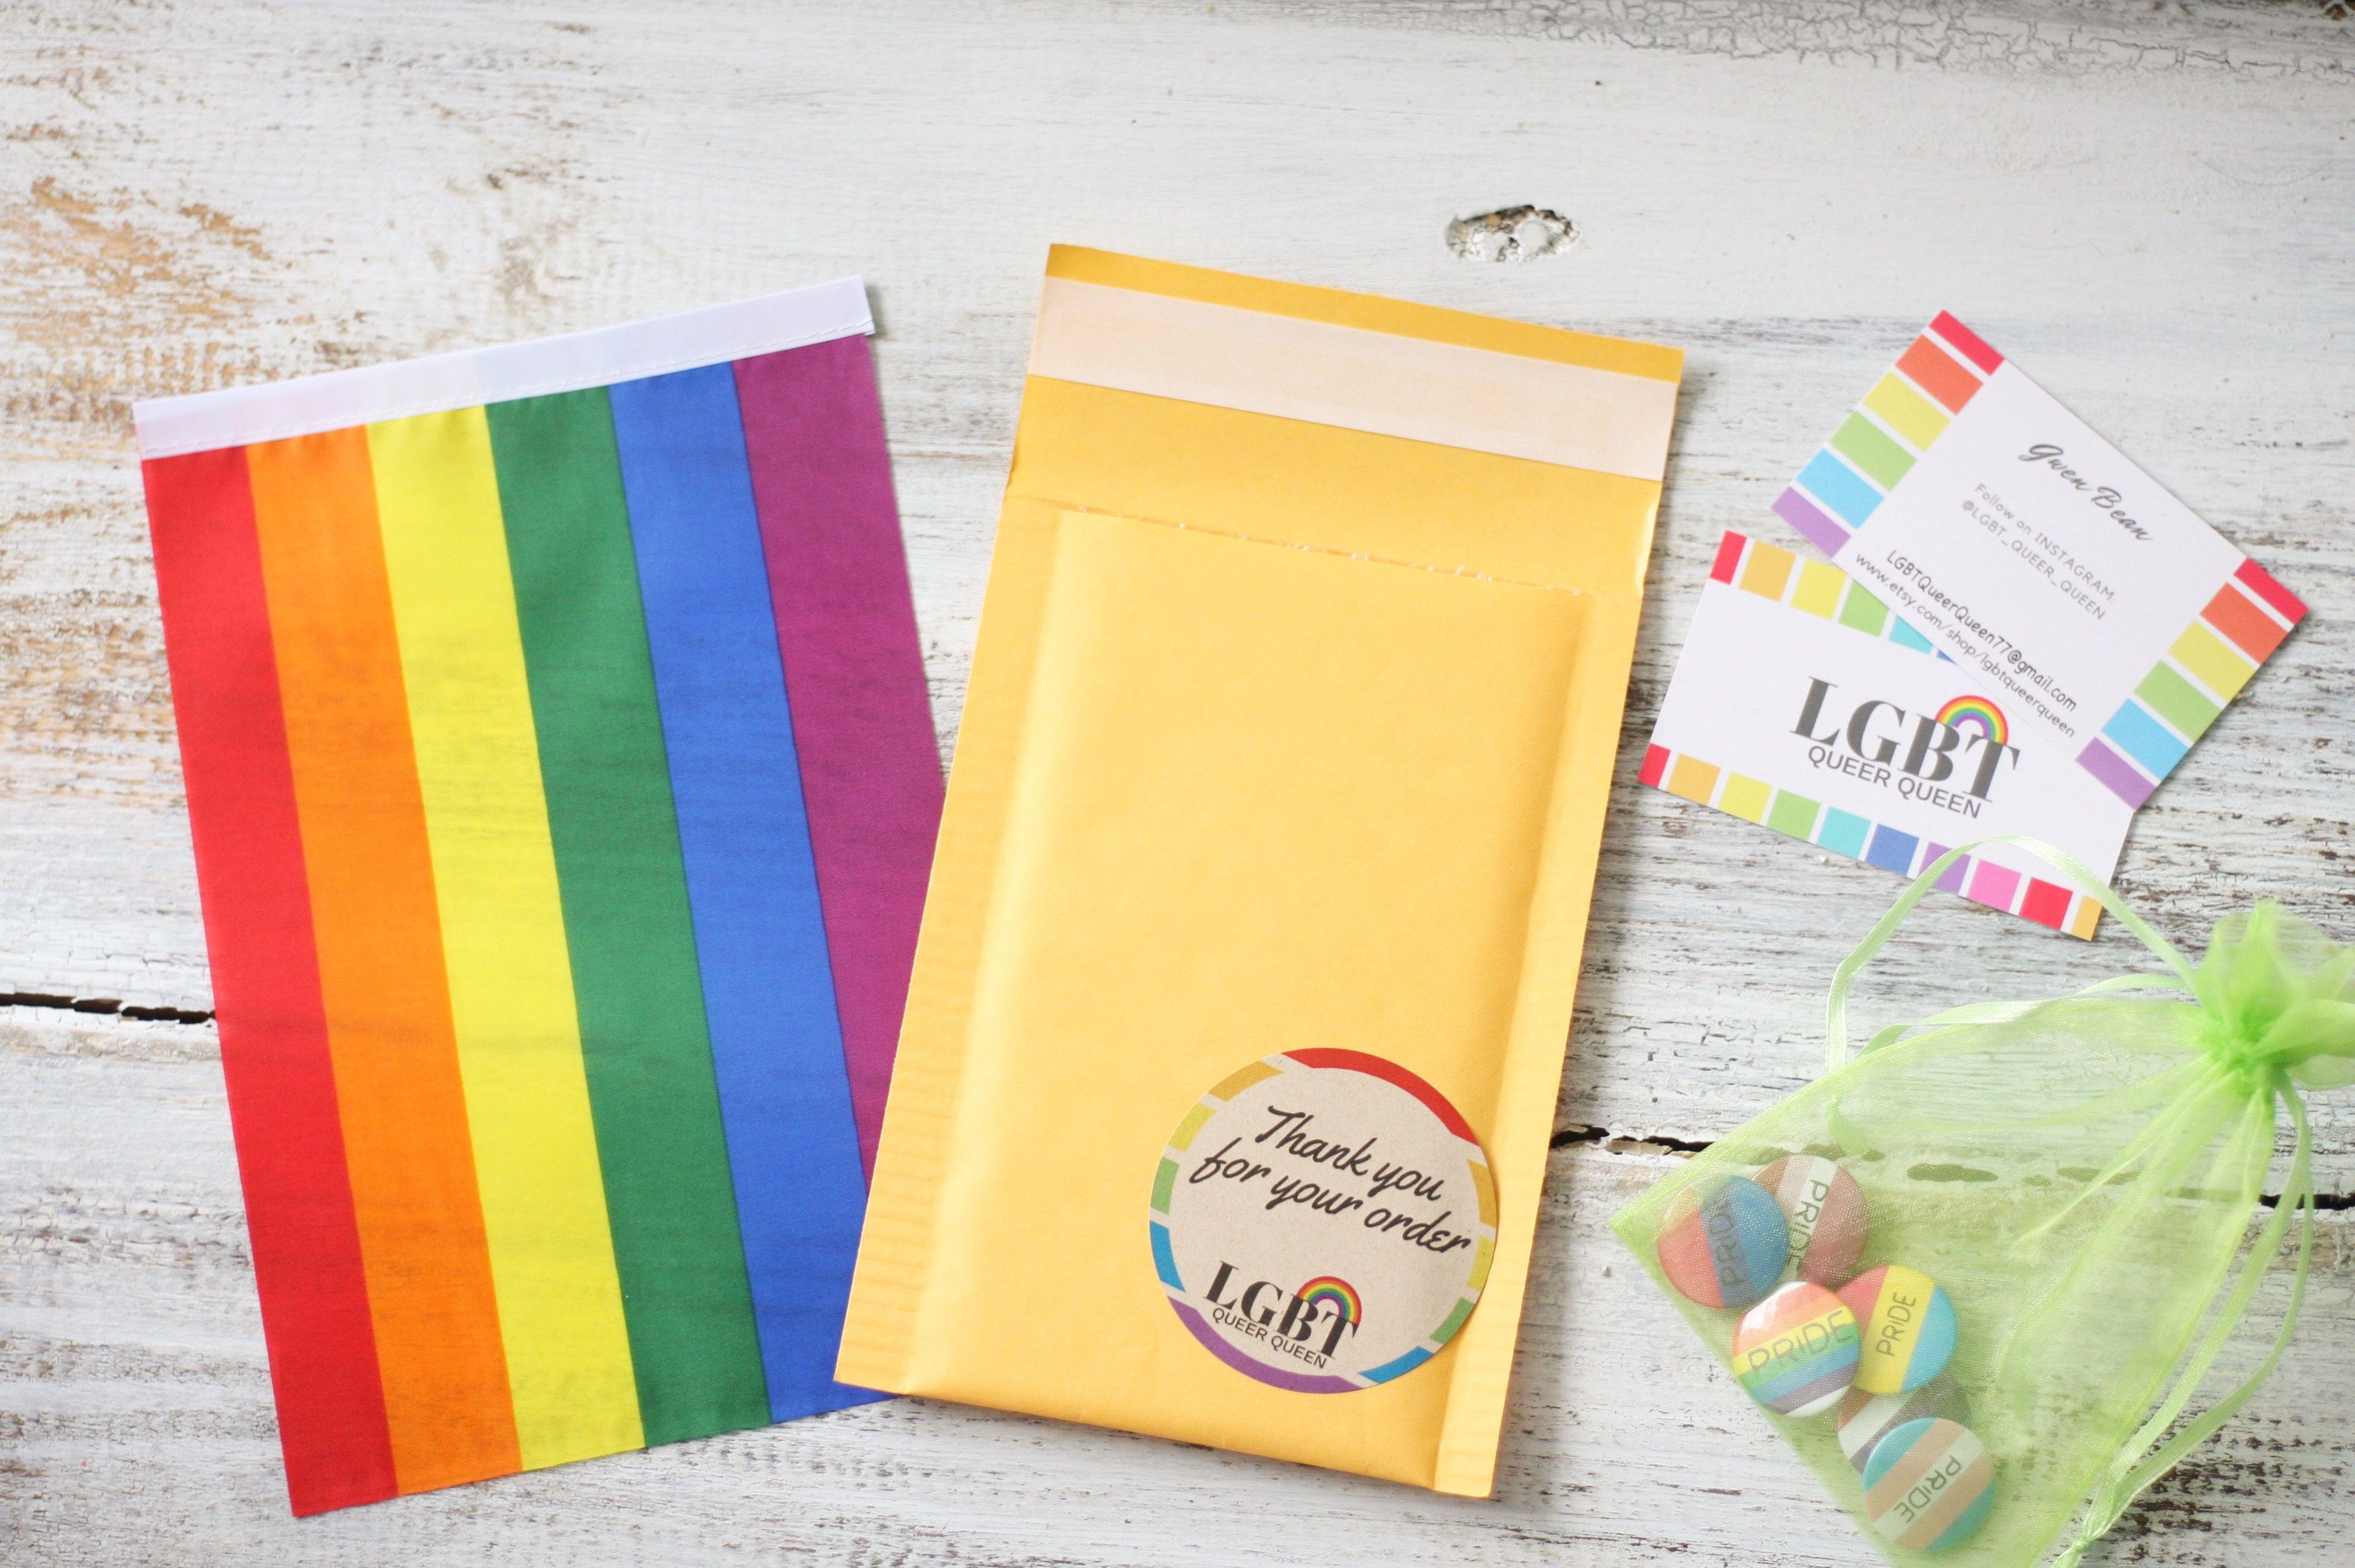 Happy pride month pride flags free baby stuff lgbtq pride